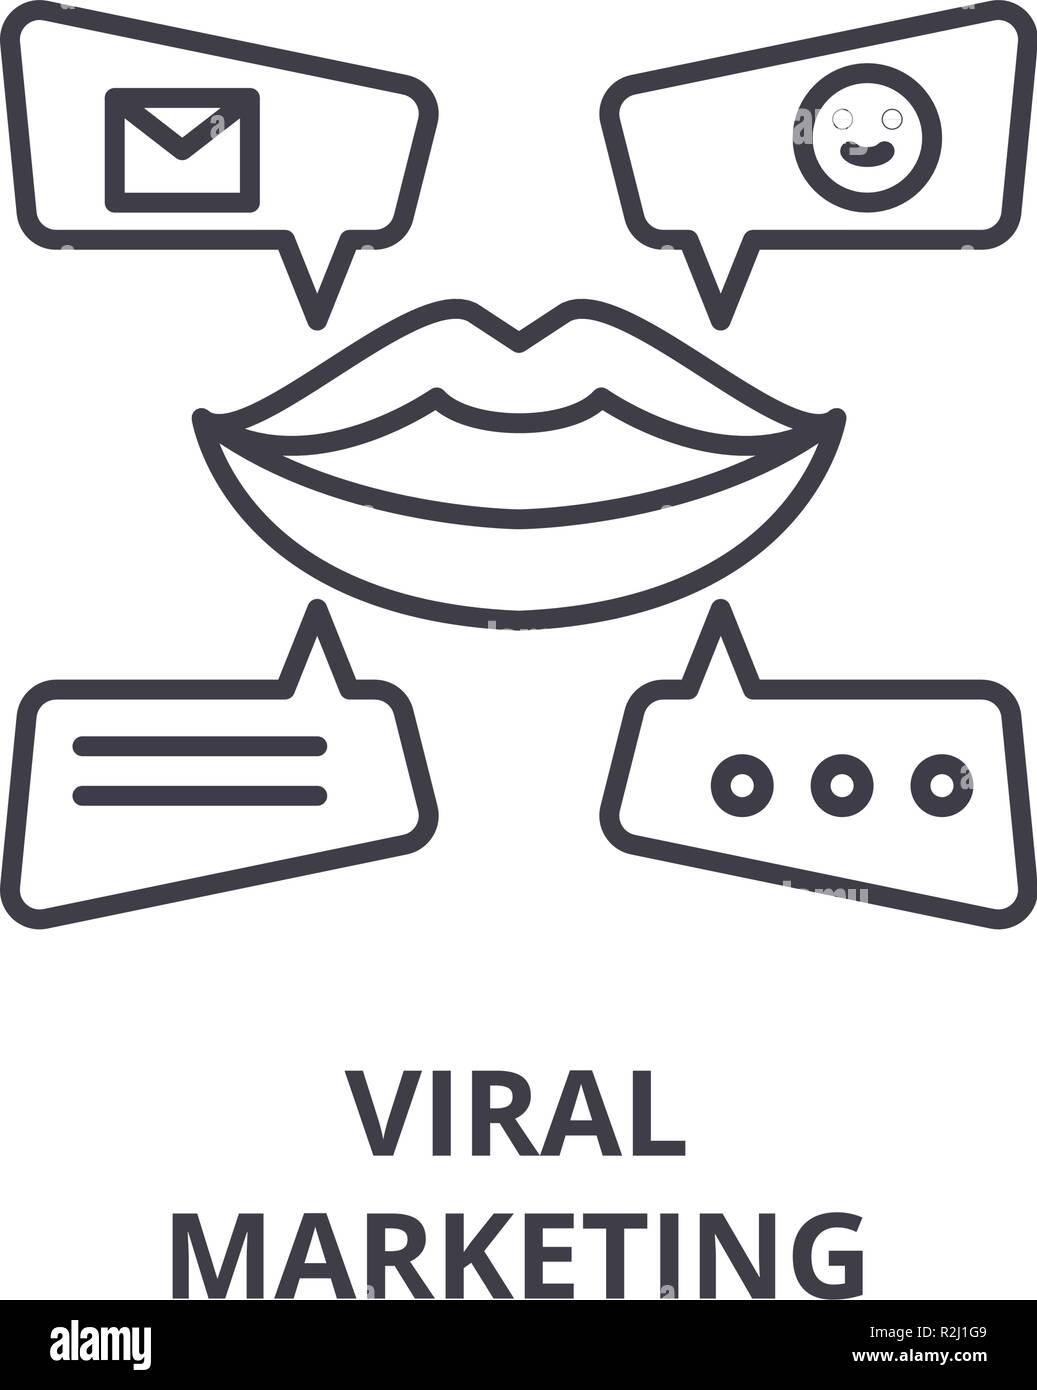 Viral marketing line icon concept. Viral marketing vector linear illustration, symbol, sign - Stock Image